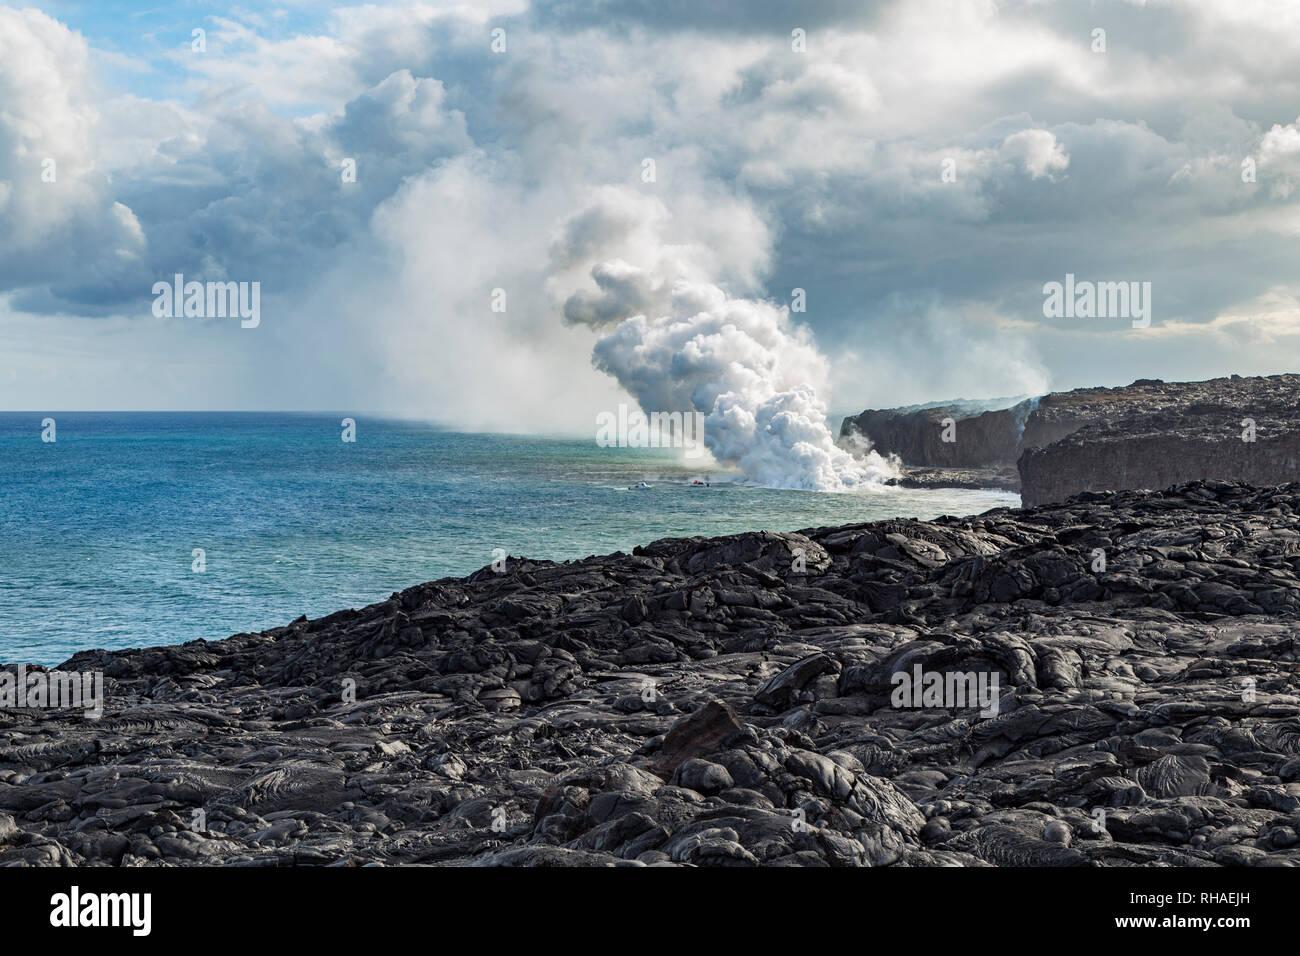 Lava of the Pu'u O'o hits the Pacific Ocean. - Stock Image